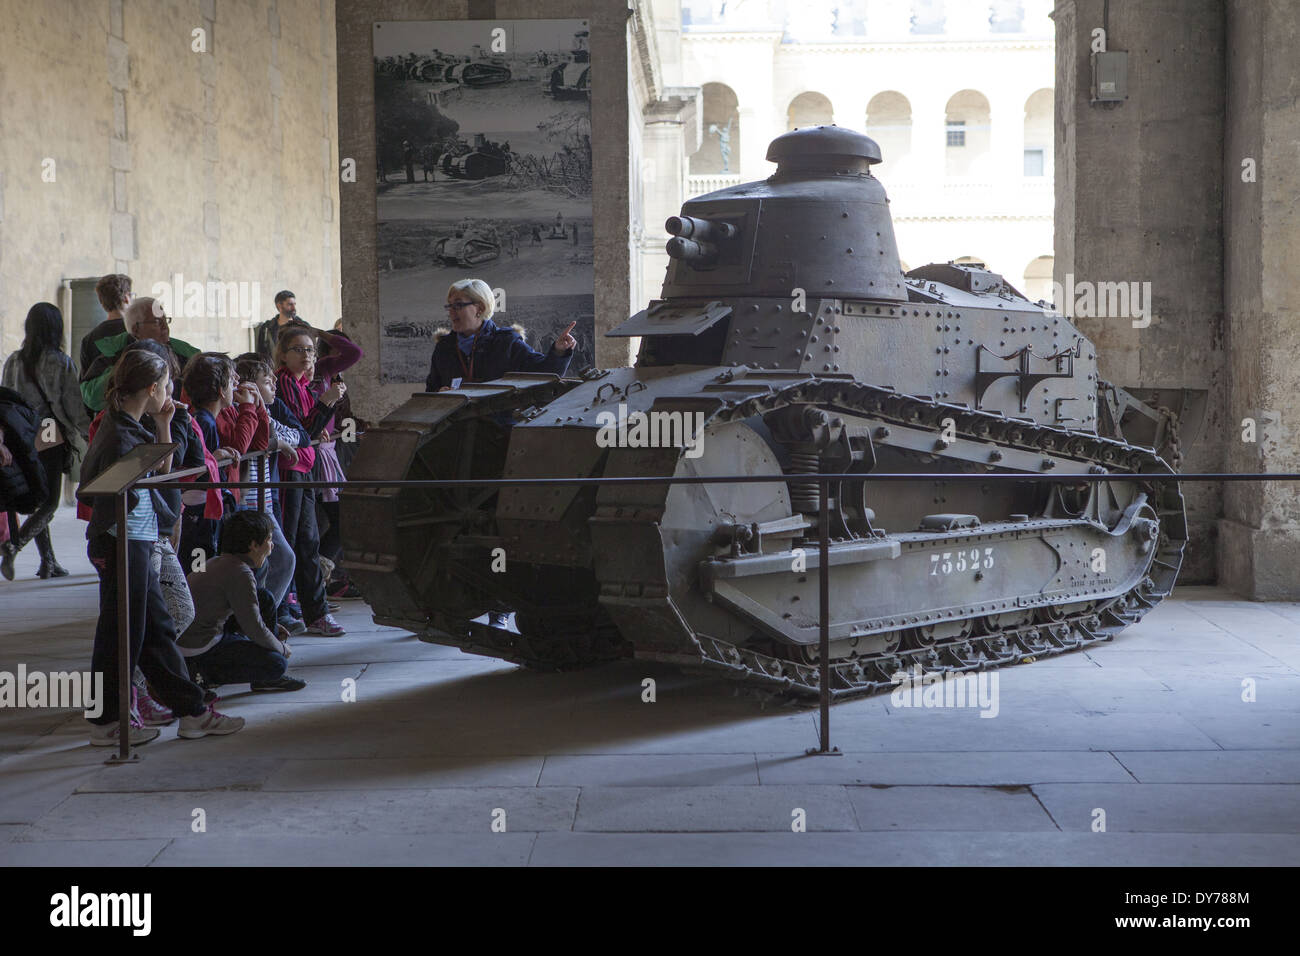 Teacher educating children about French tank at L'hospital des invalides Paris France - Stock Image